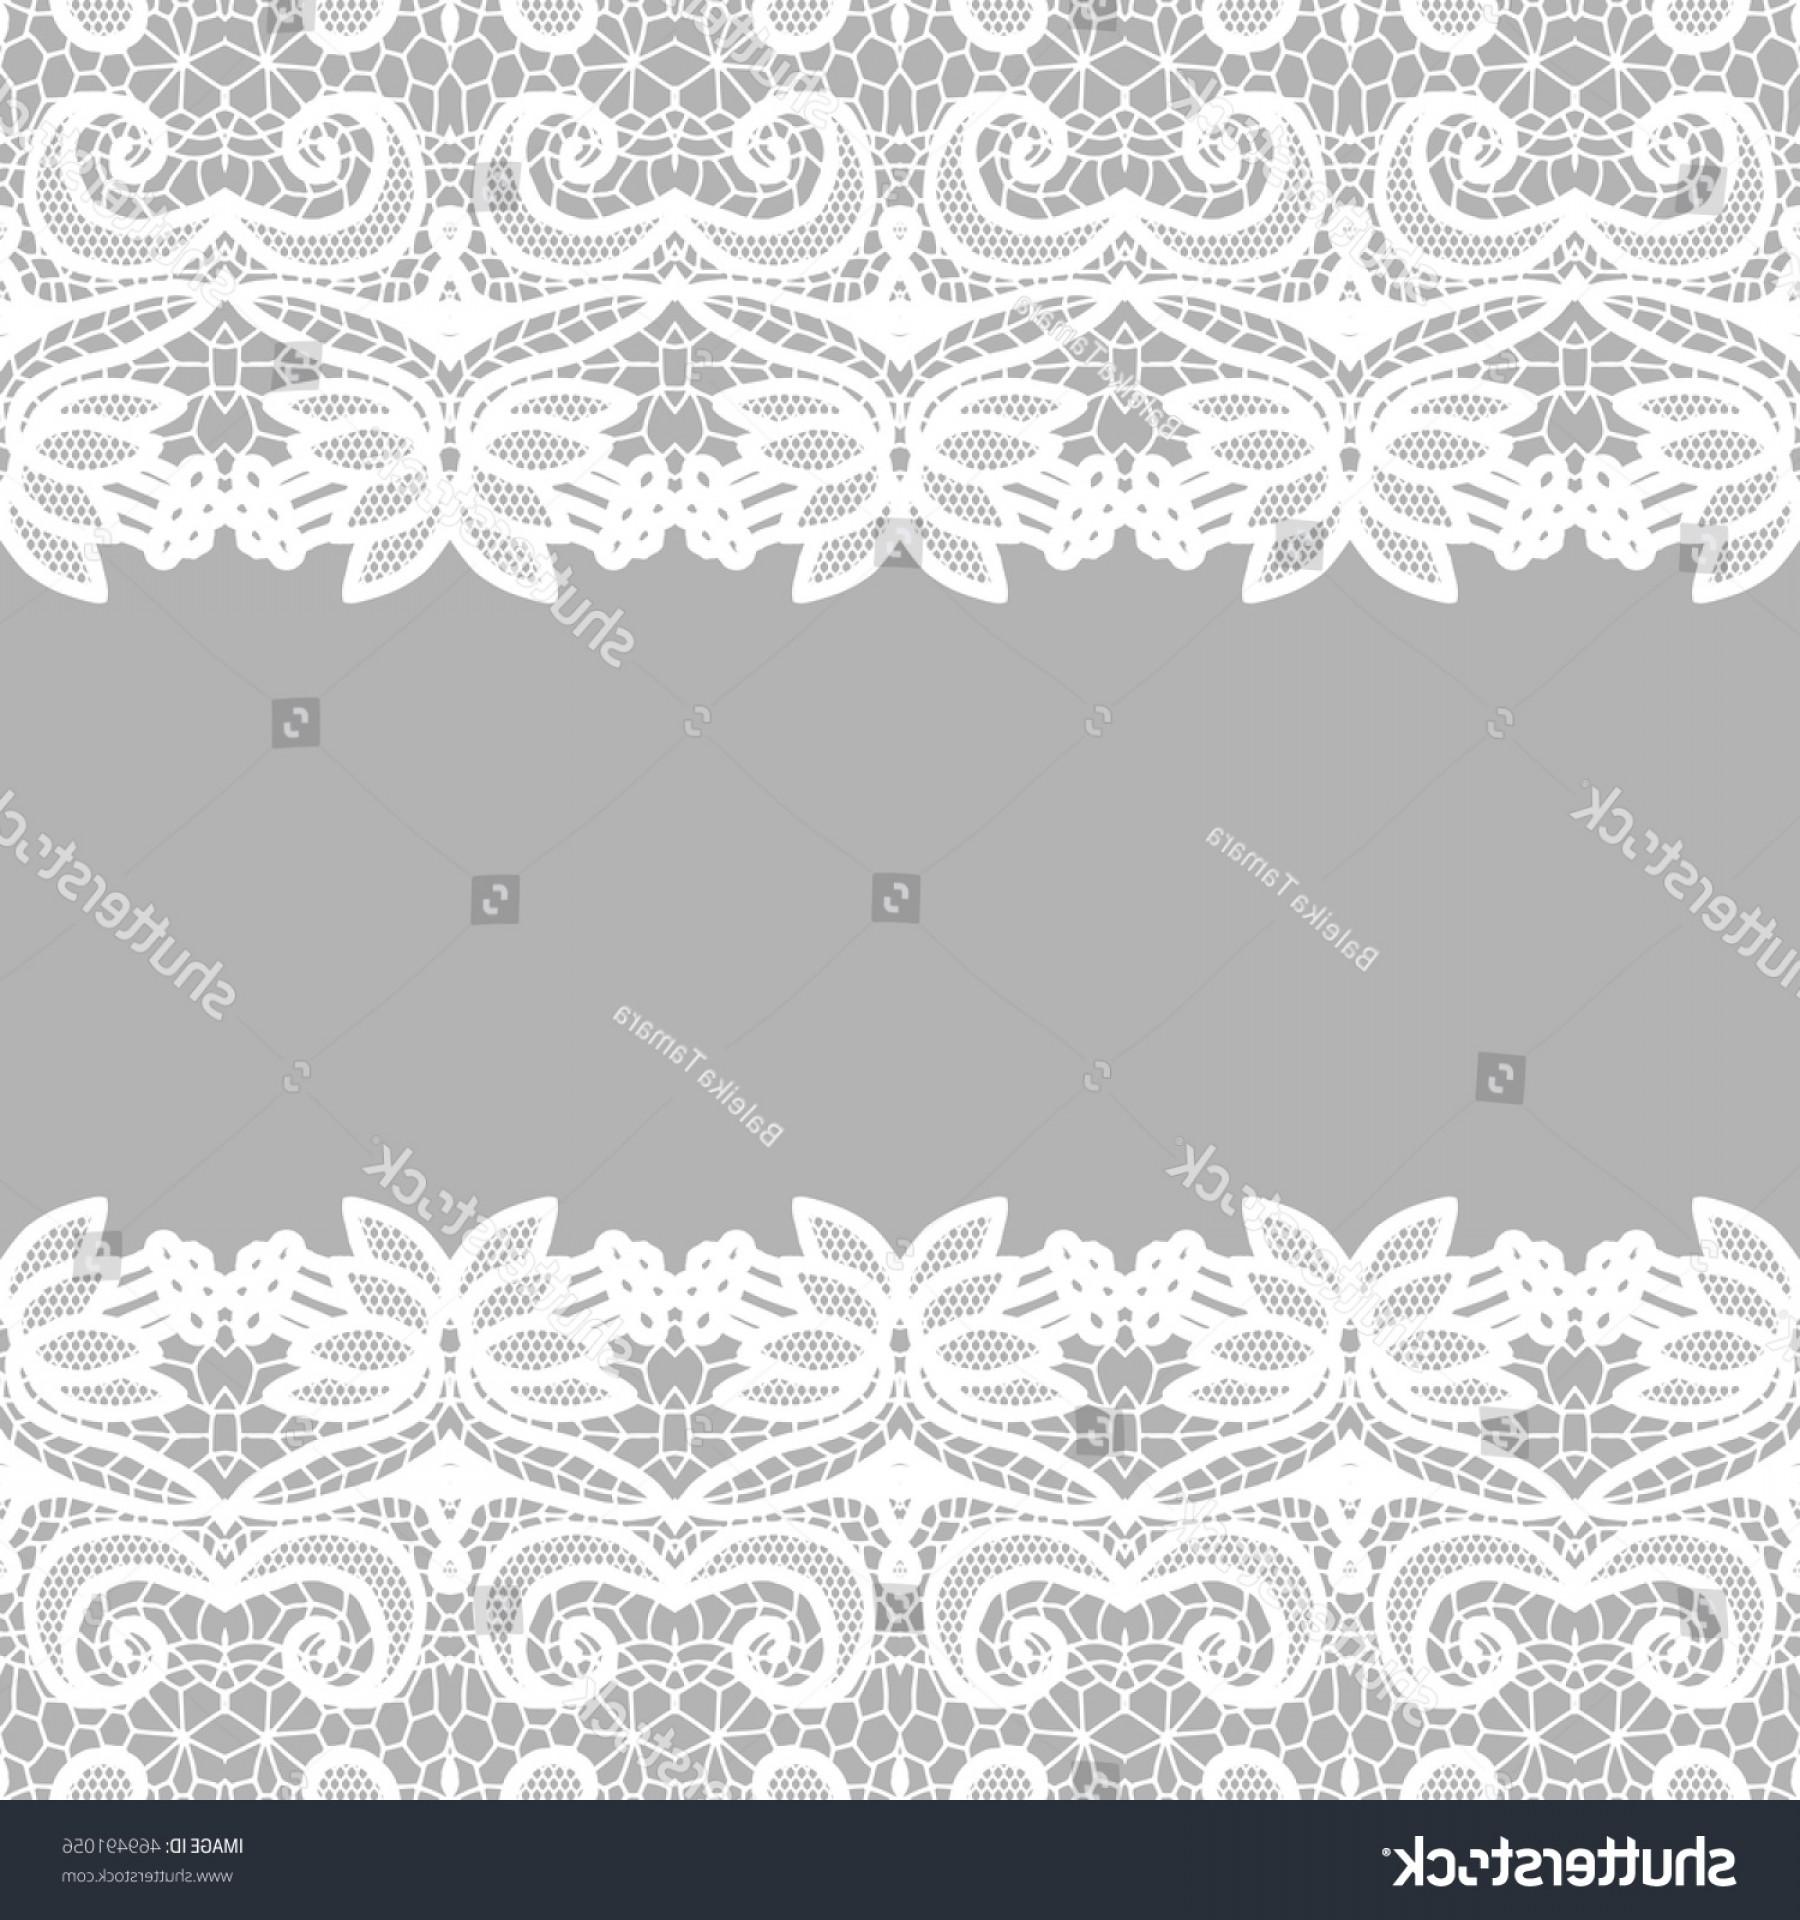 1800x1920 White Lace Border Vector Shopatcloth